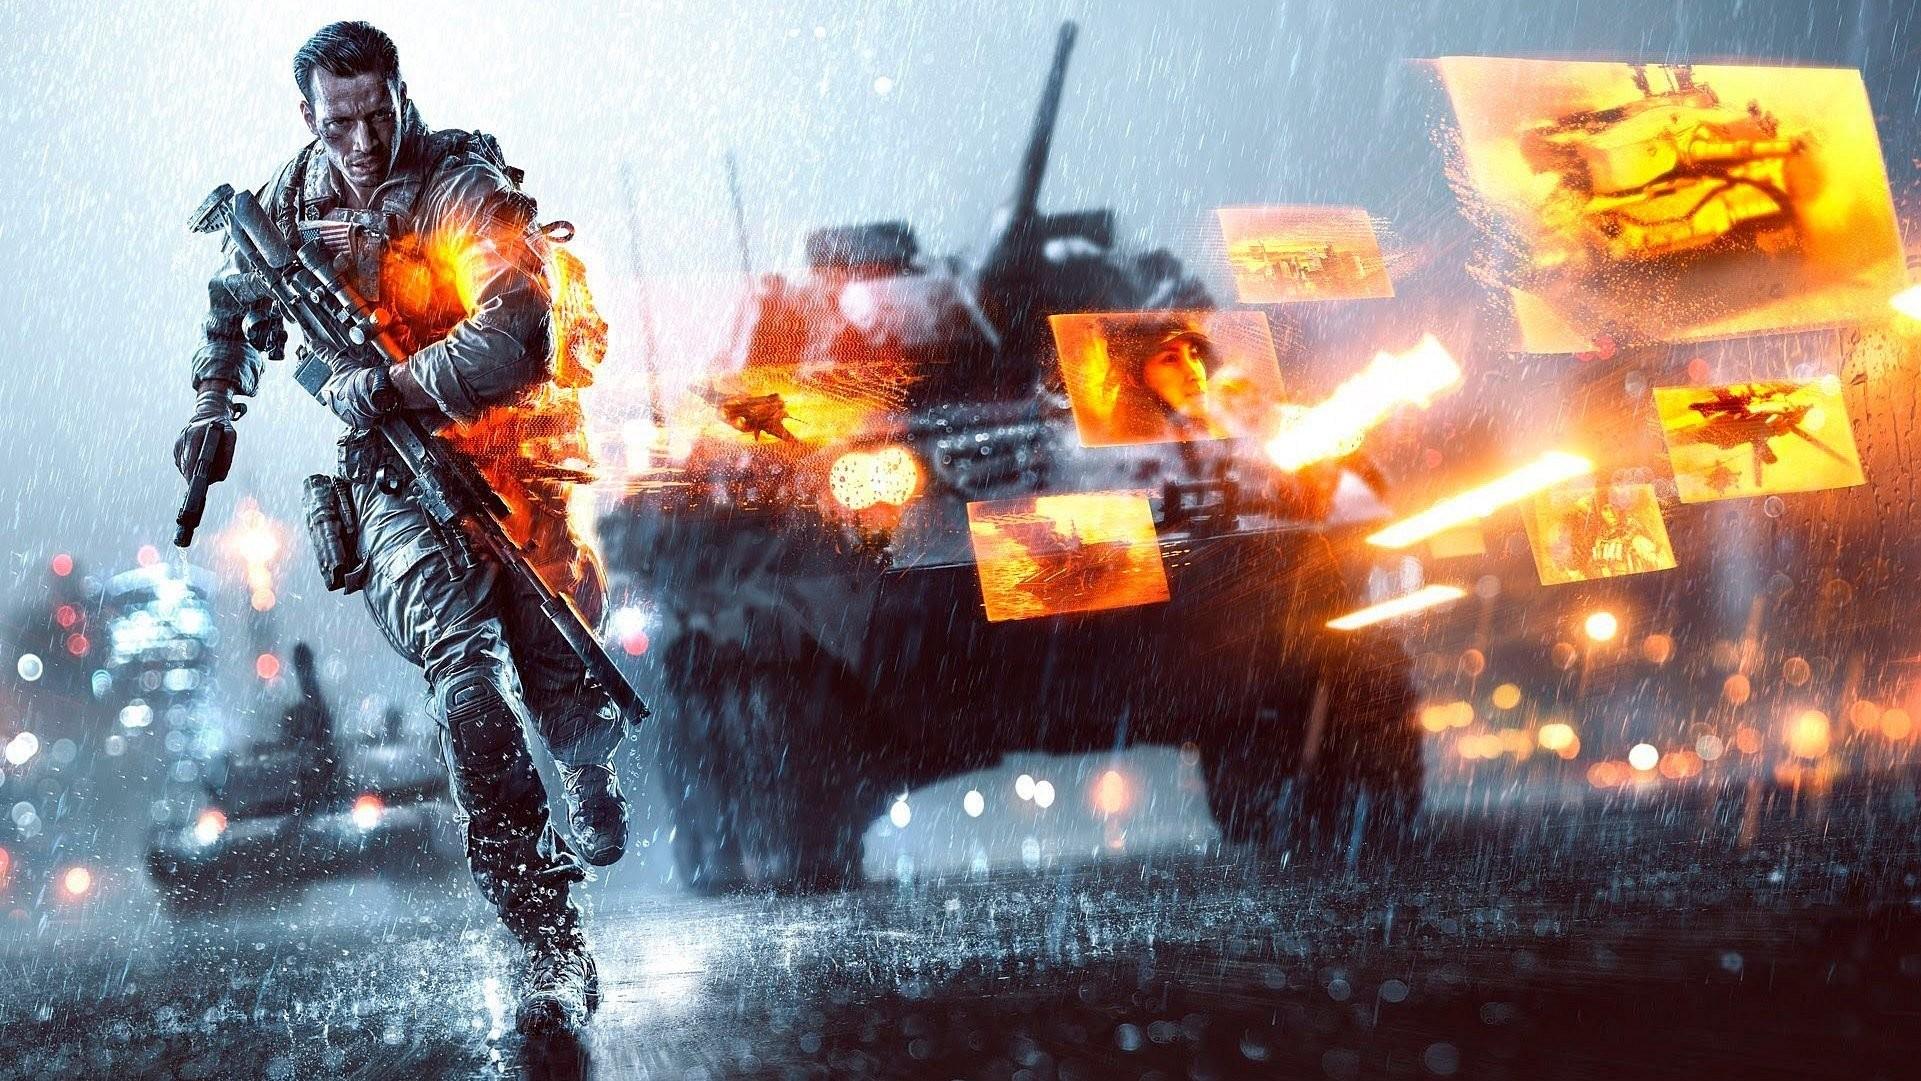 Battlefield 4 Wallpapers Wallpapertag